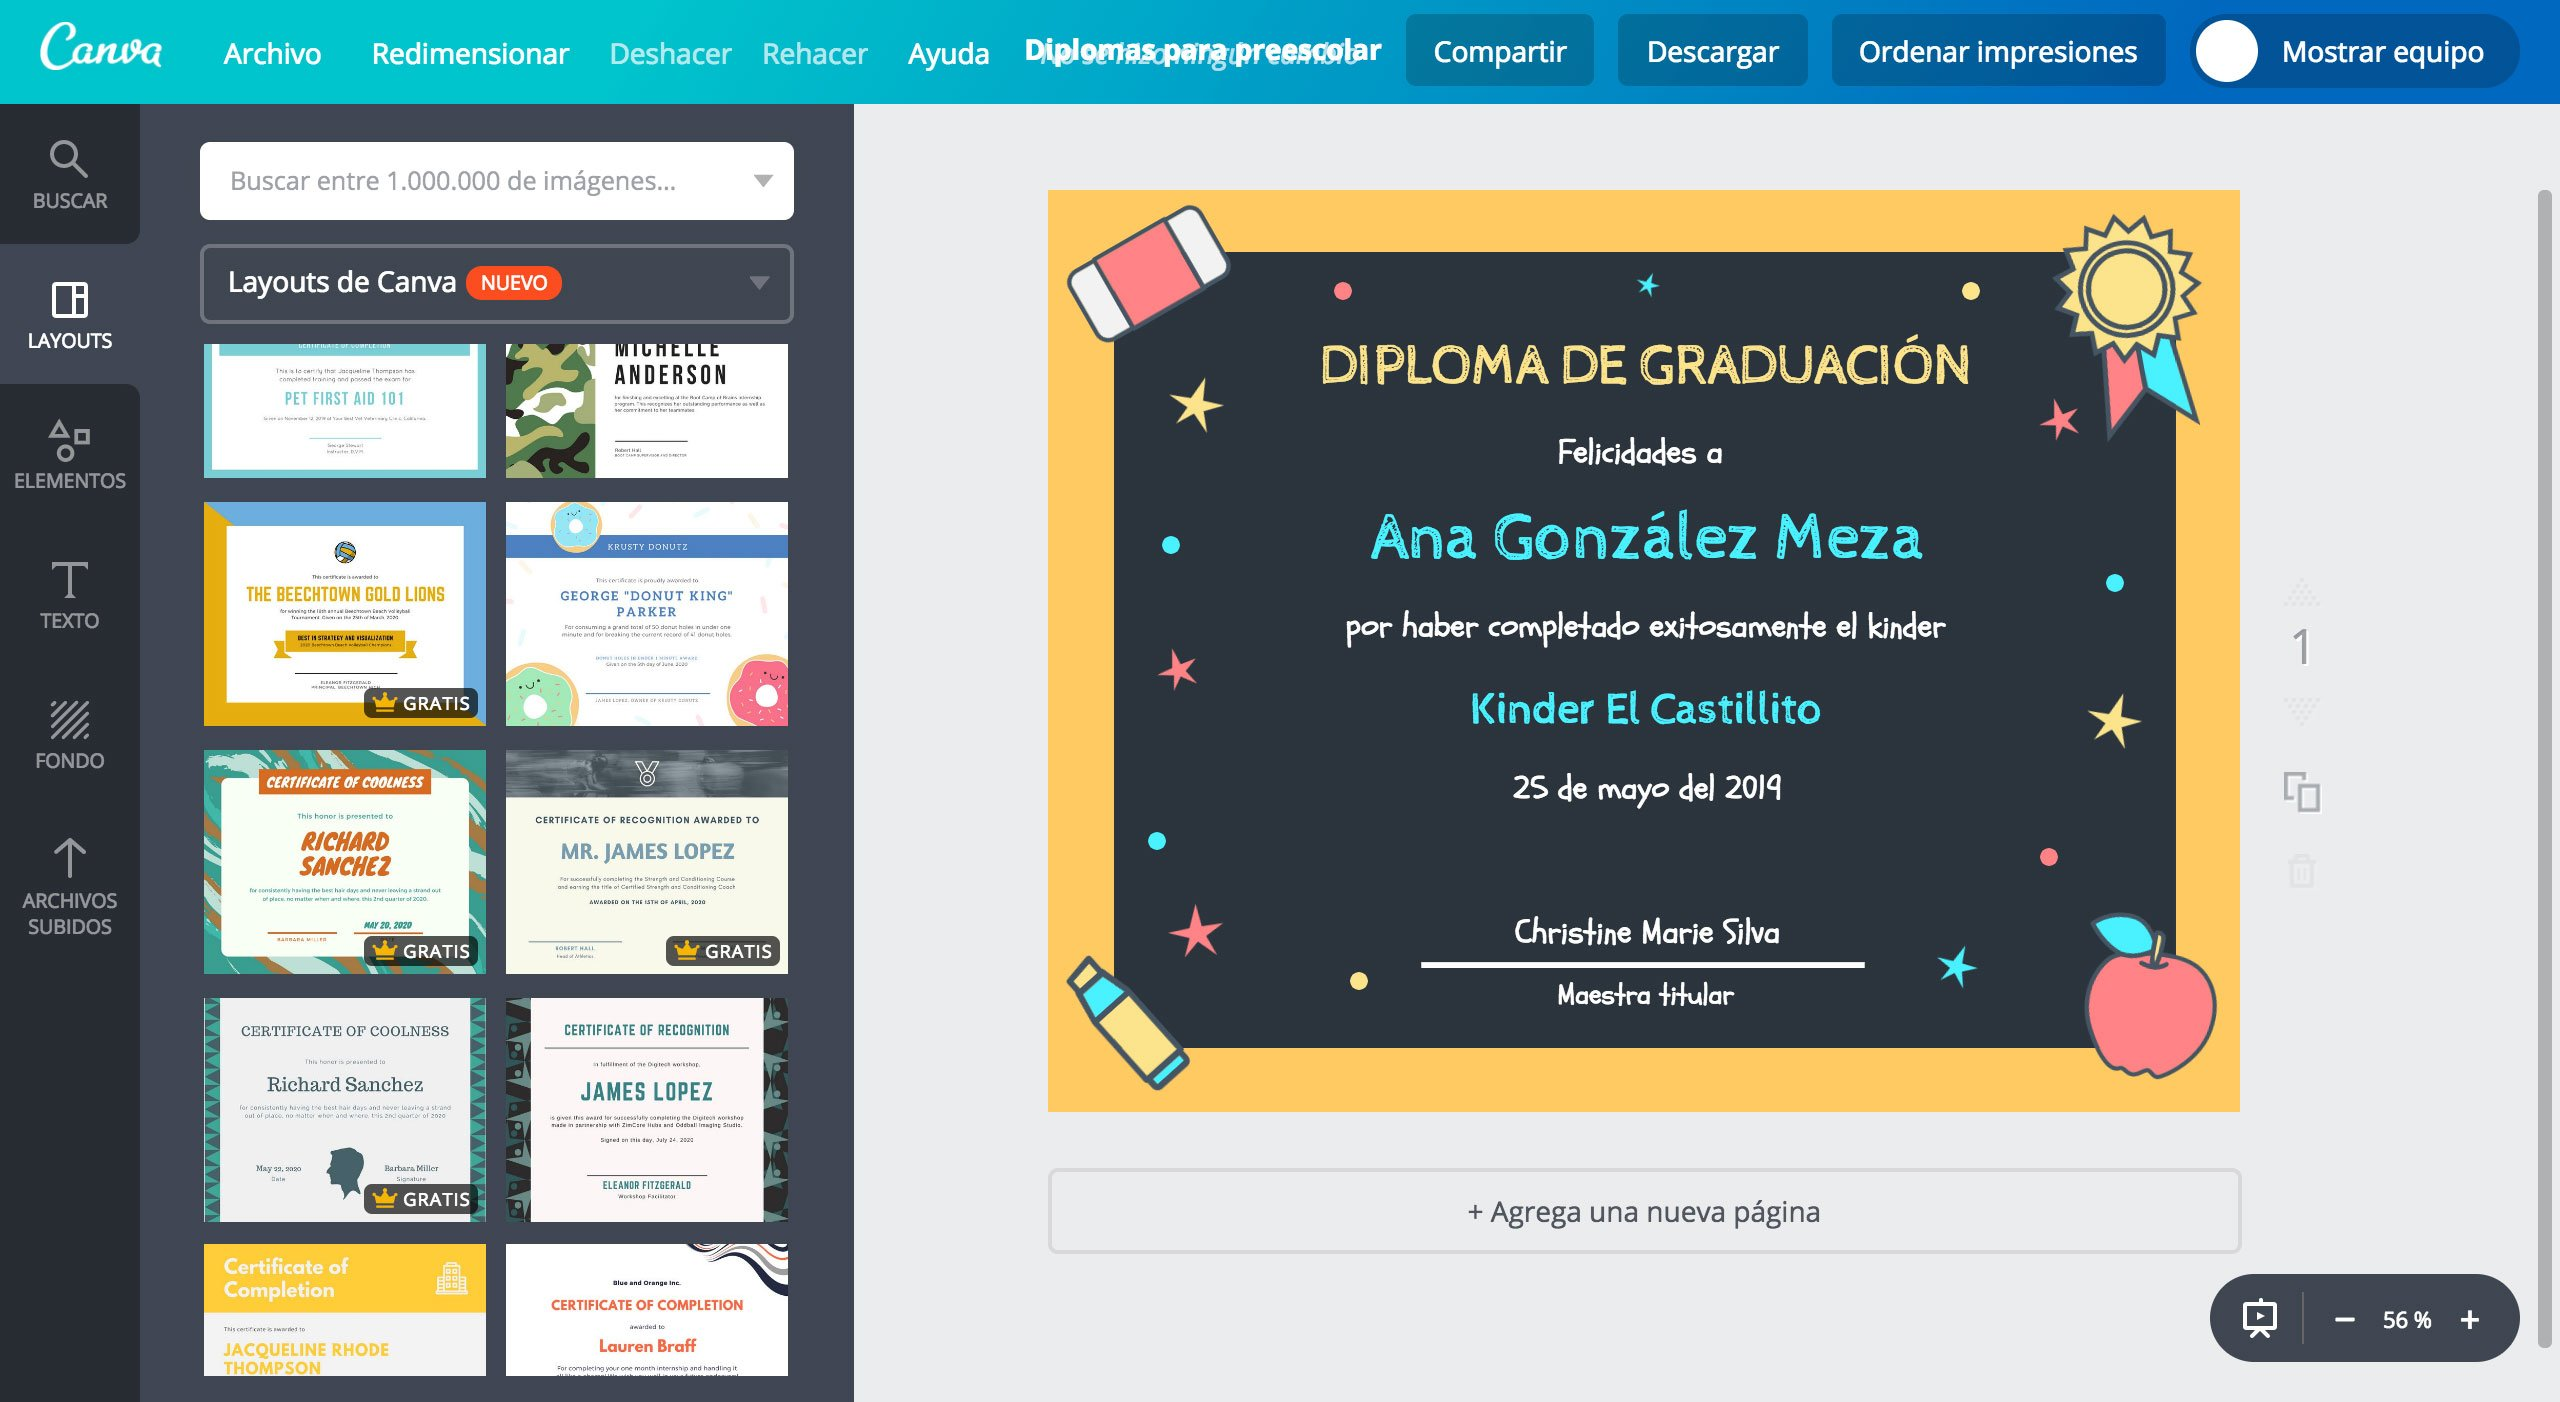 dise u00f1a diplomas para preescolar online gratis